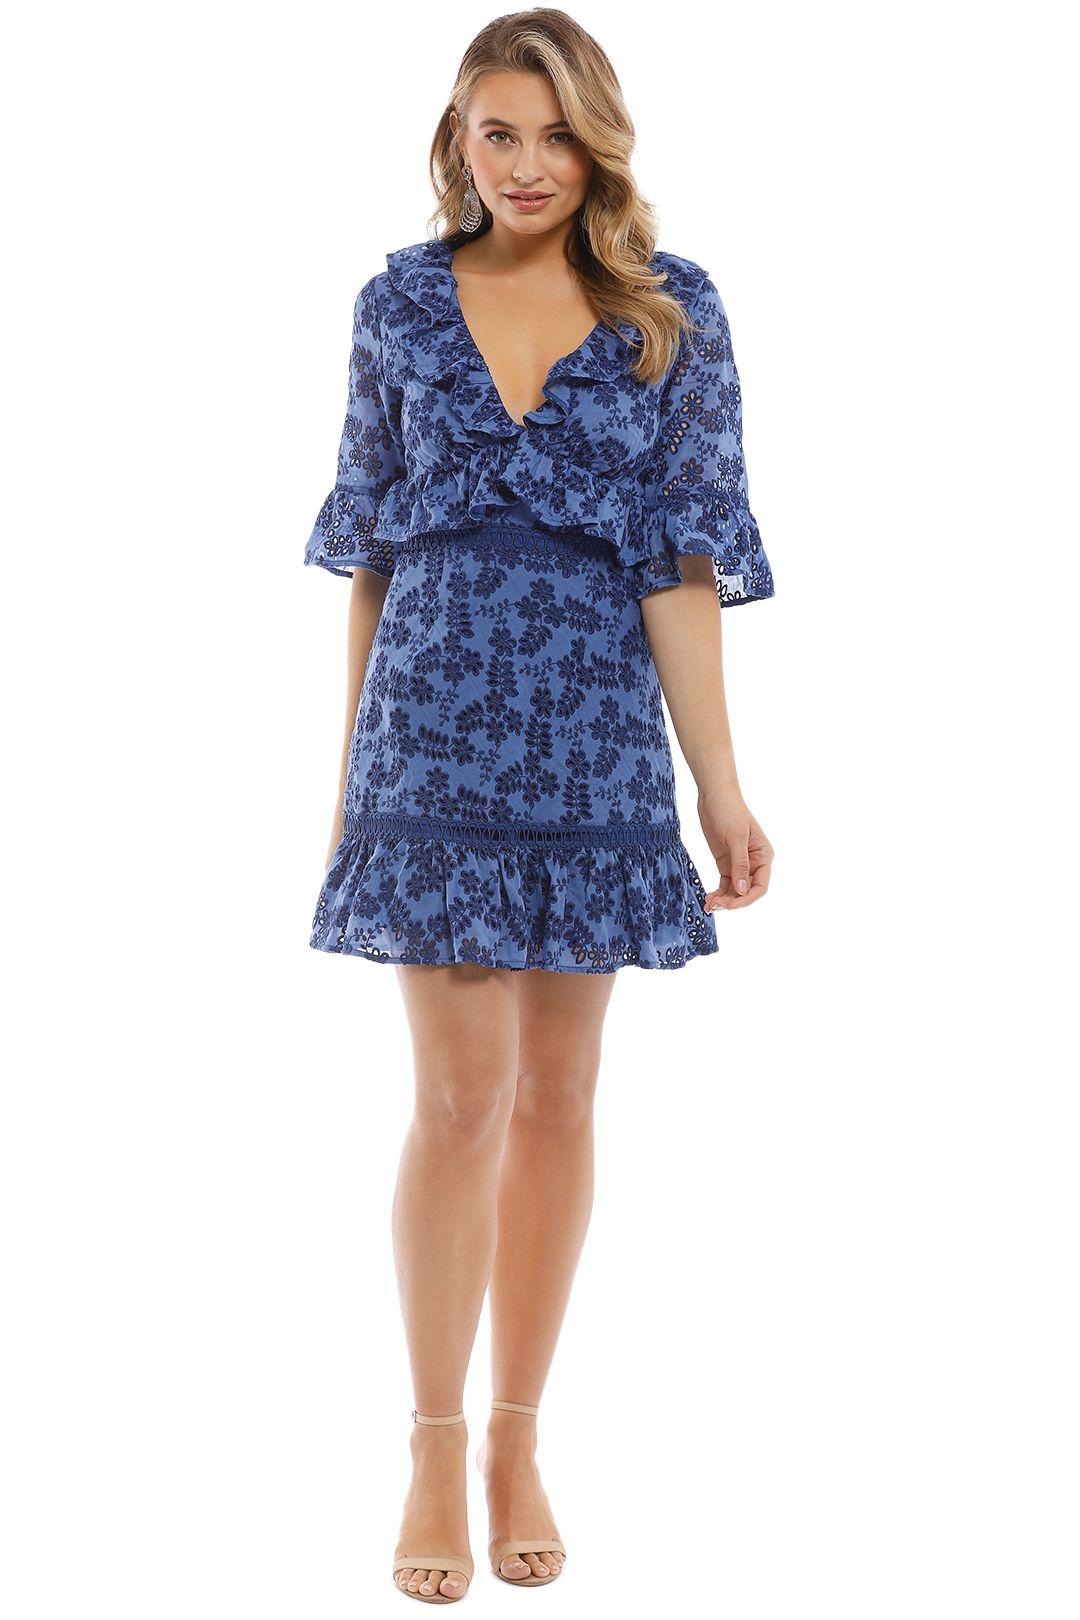 Talulah - Luna Mini Dress - Blue - Front